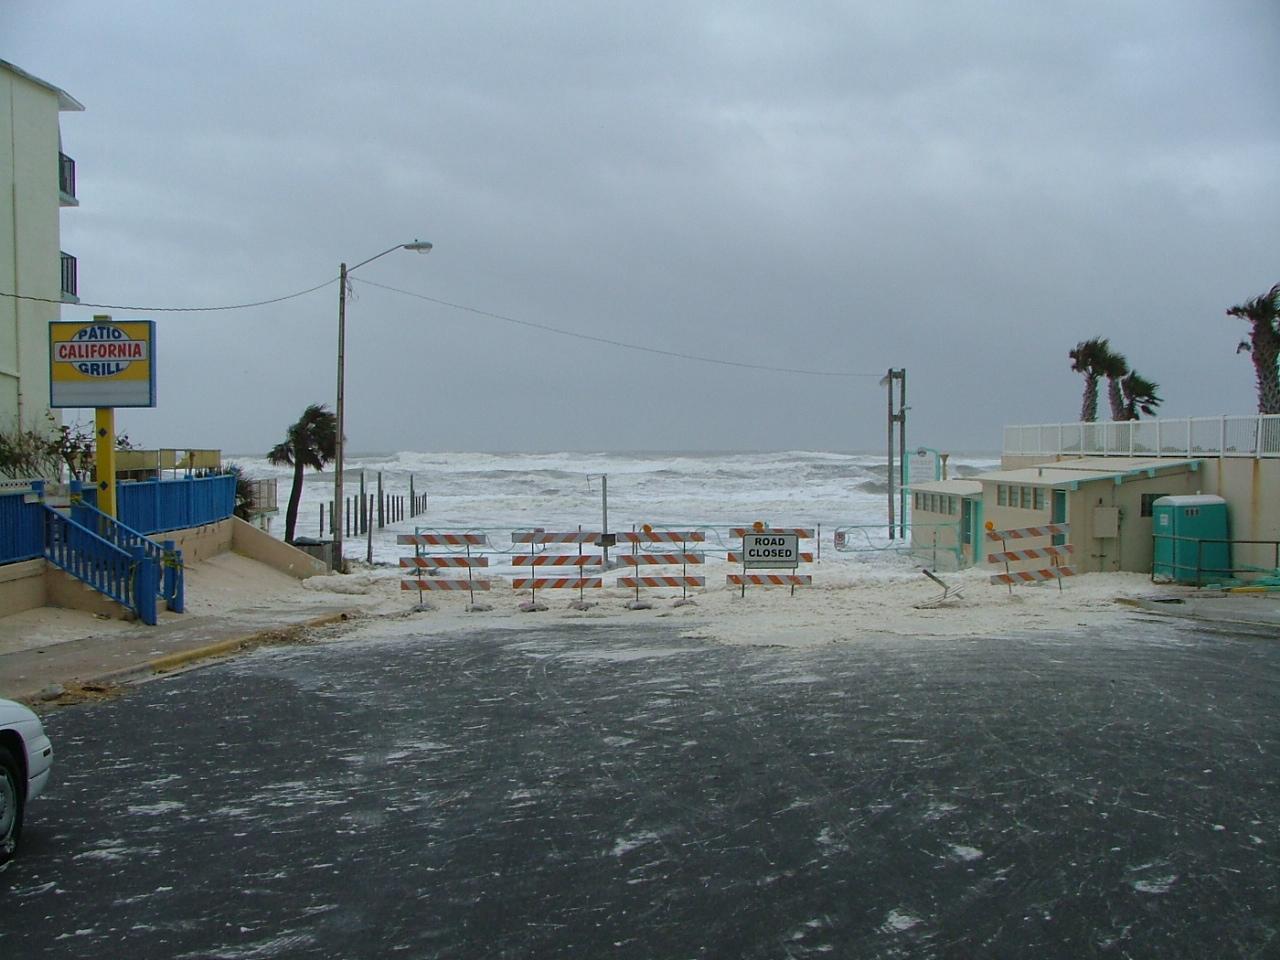 http://upload.wikimedia.org/wikipedia/commons/2/2b/DaytonaBeach-StormSurge1-US92.jpg